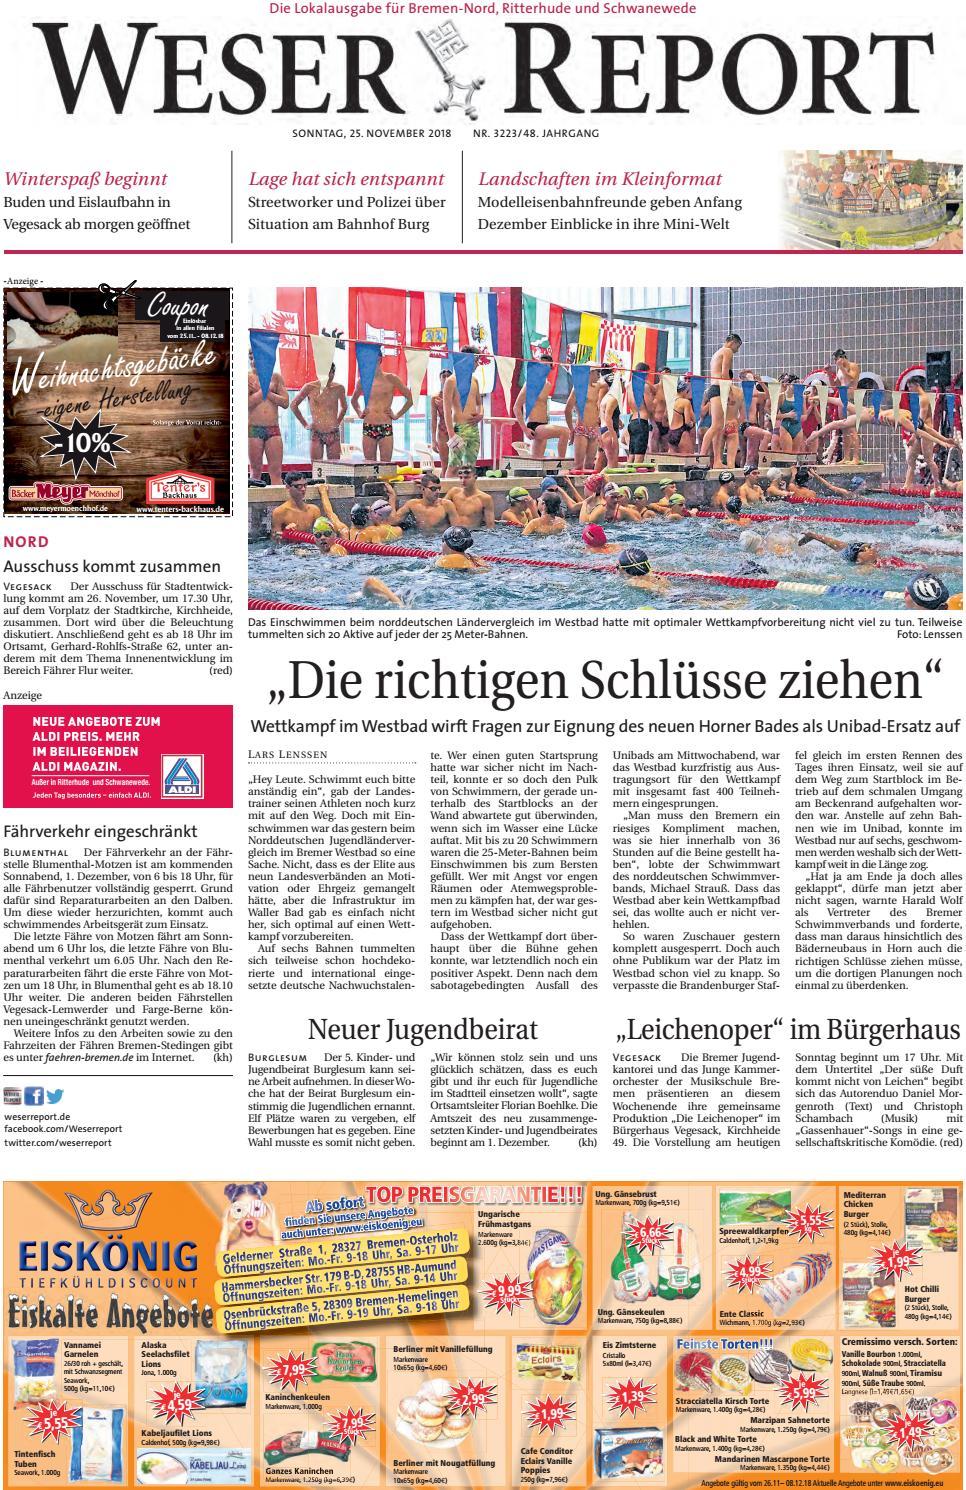 Weser Report - Nord vom 25.11.2018 by KPS Verlagsgesellschaft mbH ...